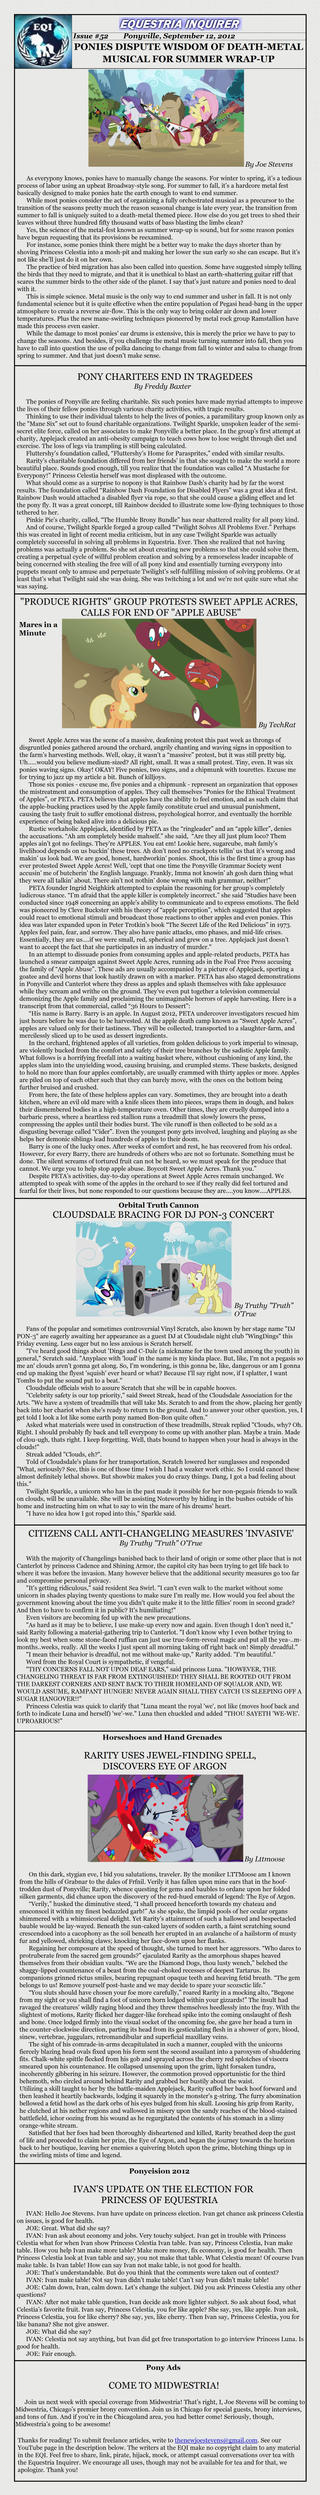 Equestria Inquirer 52 by JoeStevensInc